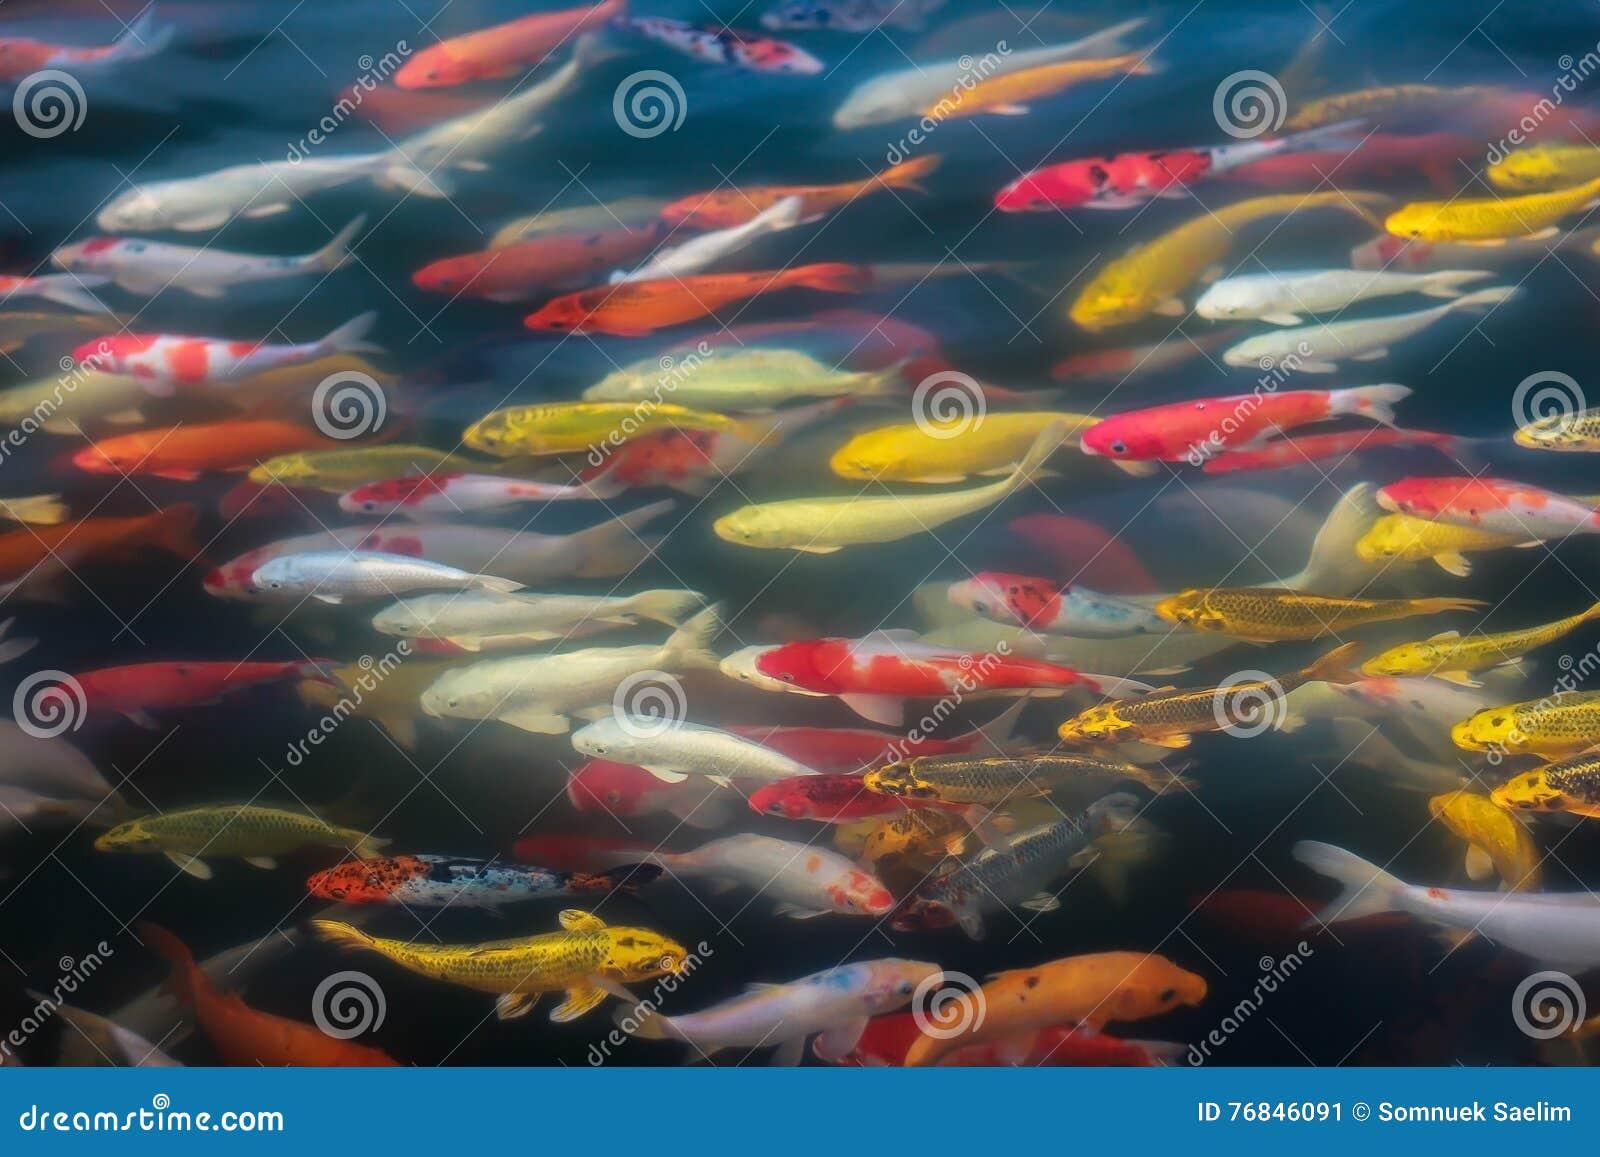 Koi fish swimming beautiful background stock photography for Fish swimming backwards